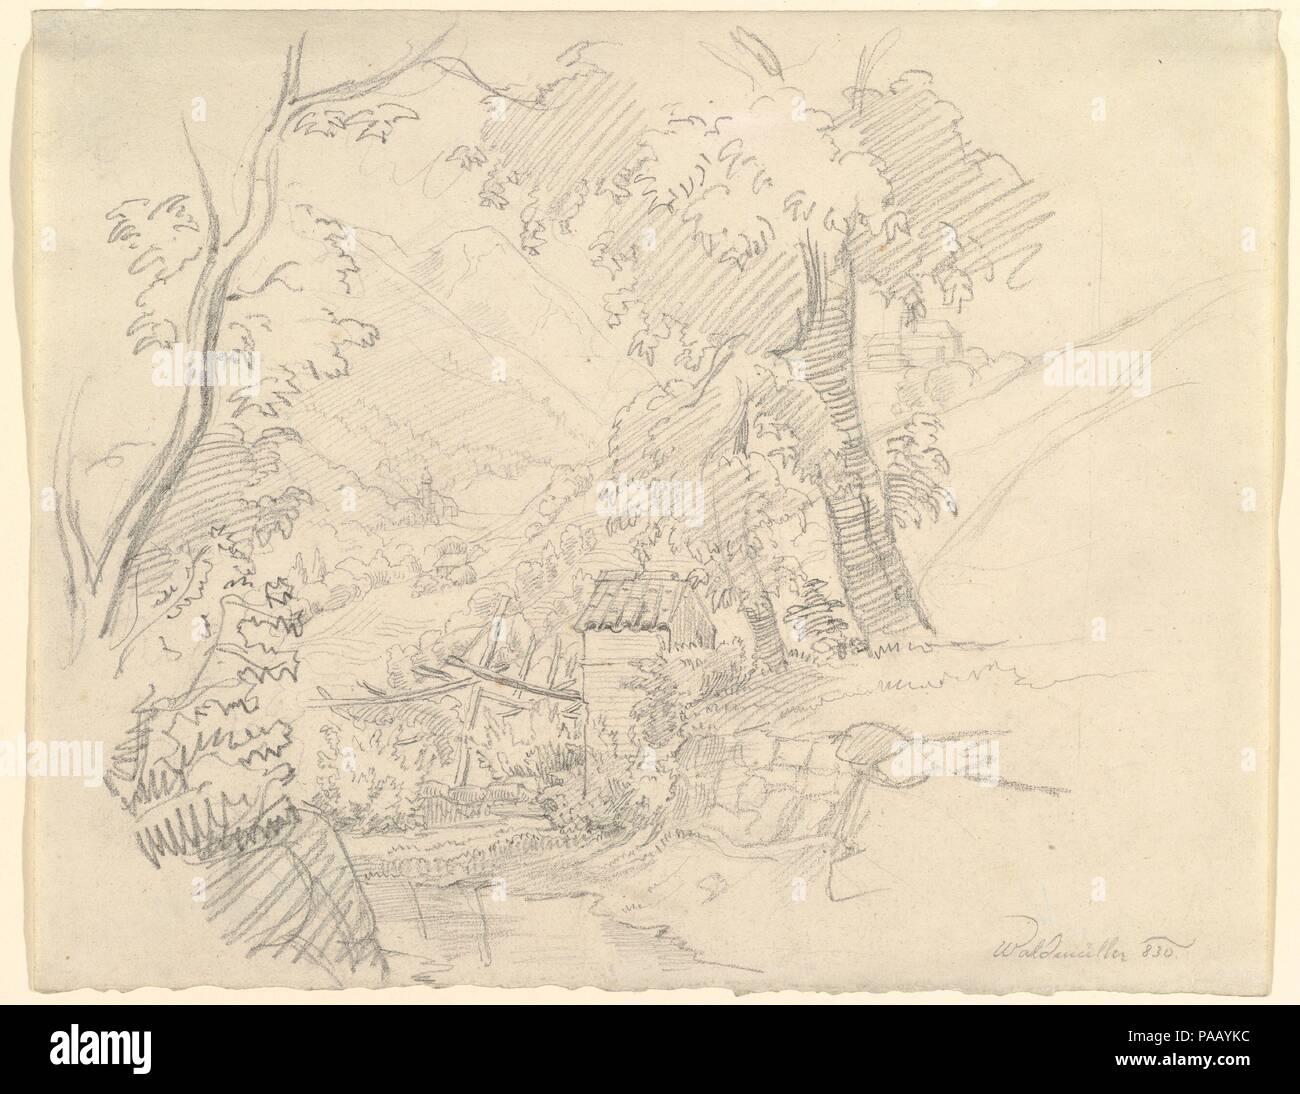 Landscape with a View in a Valley. Artist: Ferdinand Georg Waldmüller (Austrian, Vienna 1793-1865 Helmstreitmühle in der Hinterbrühl). Dimensions: sheet: 8 7/8 x 11 3/16 in. (22.5 x 28.4 cm). Museum: Metropolitan Museum of Art, New York, USA. - Stock Image